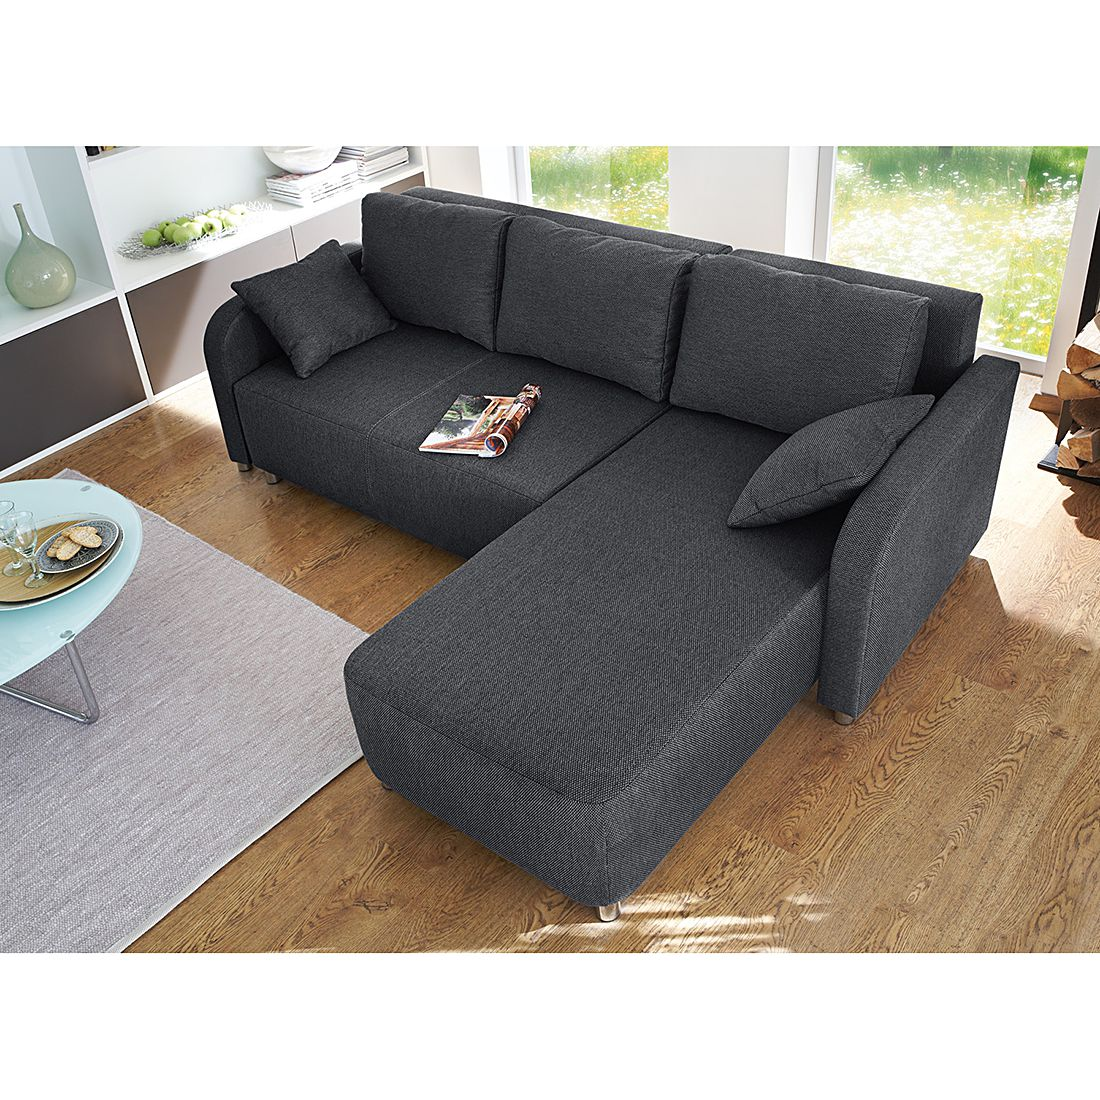 home24 loftscape Ecksofa Tetony 2-Sitzer Grau Webstoff 215x85x155 cm (BxHxT) mit Schlaffunktion Modern